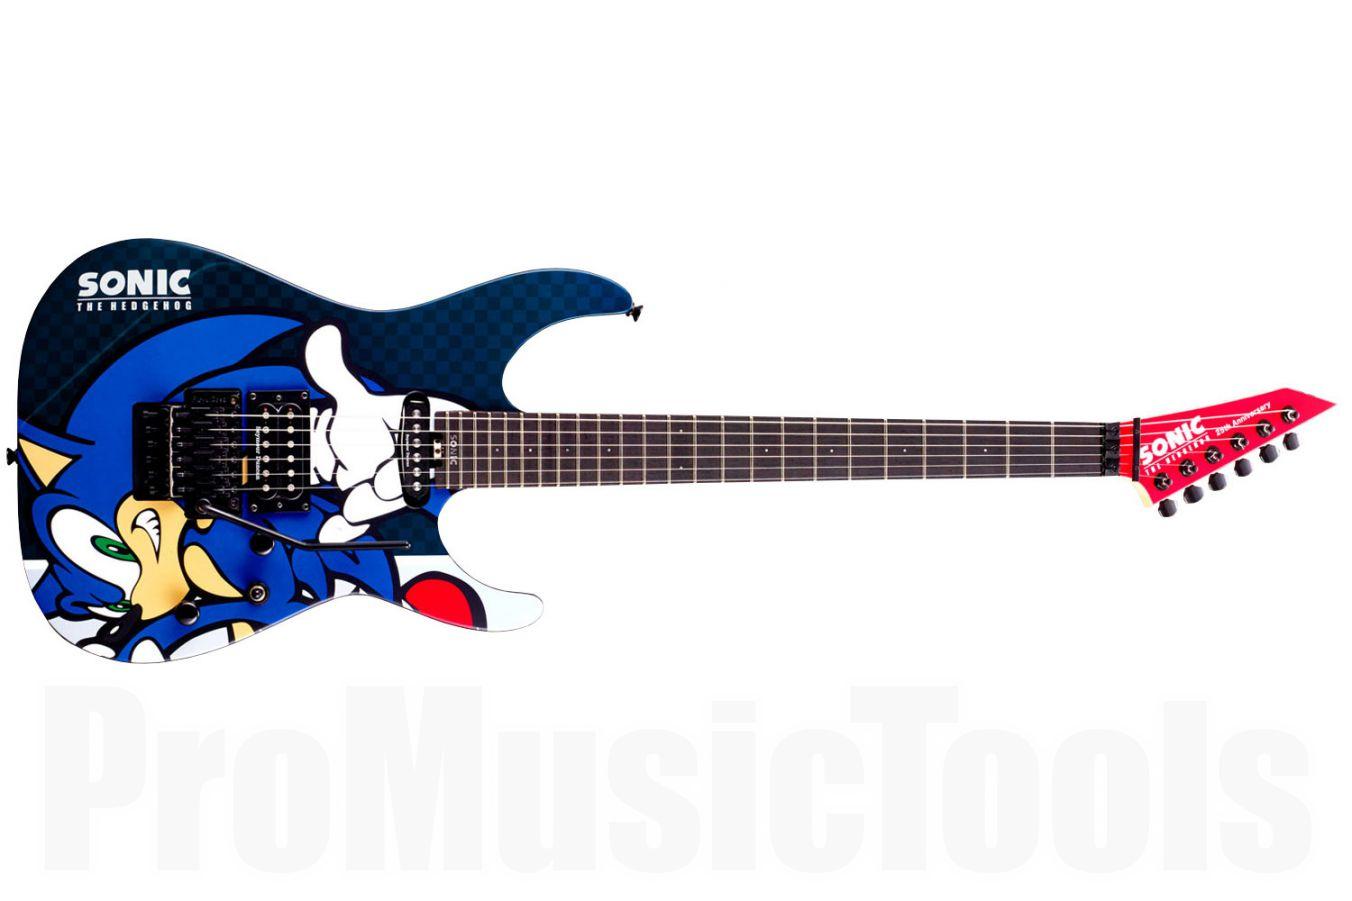 esp ltd sn 25th sonic the hedgehog guitar ii limited edition promusictools. Black Bedroom Furniture Sets. Home Design Ideas